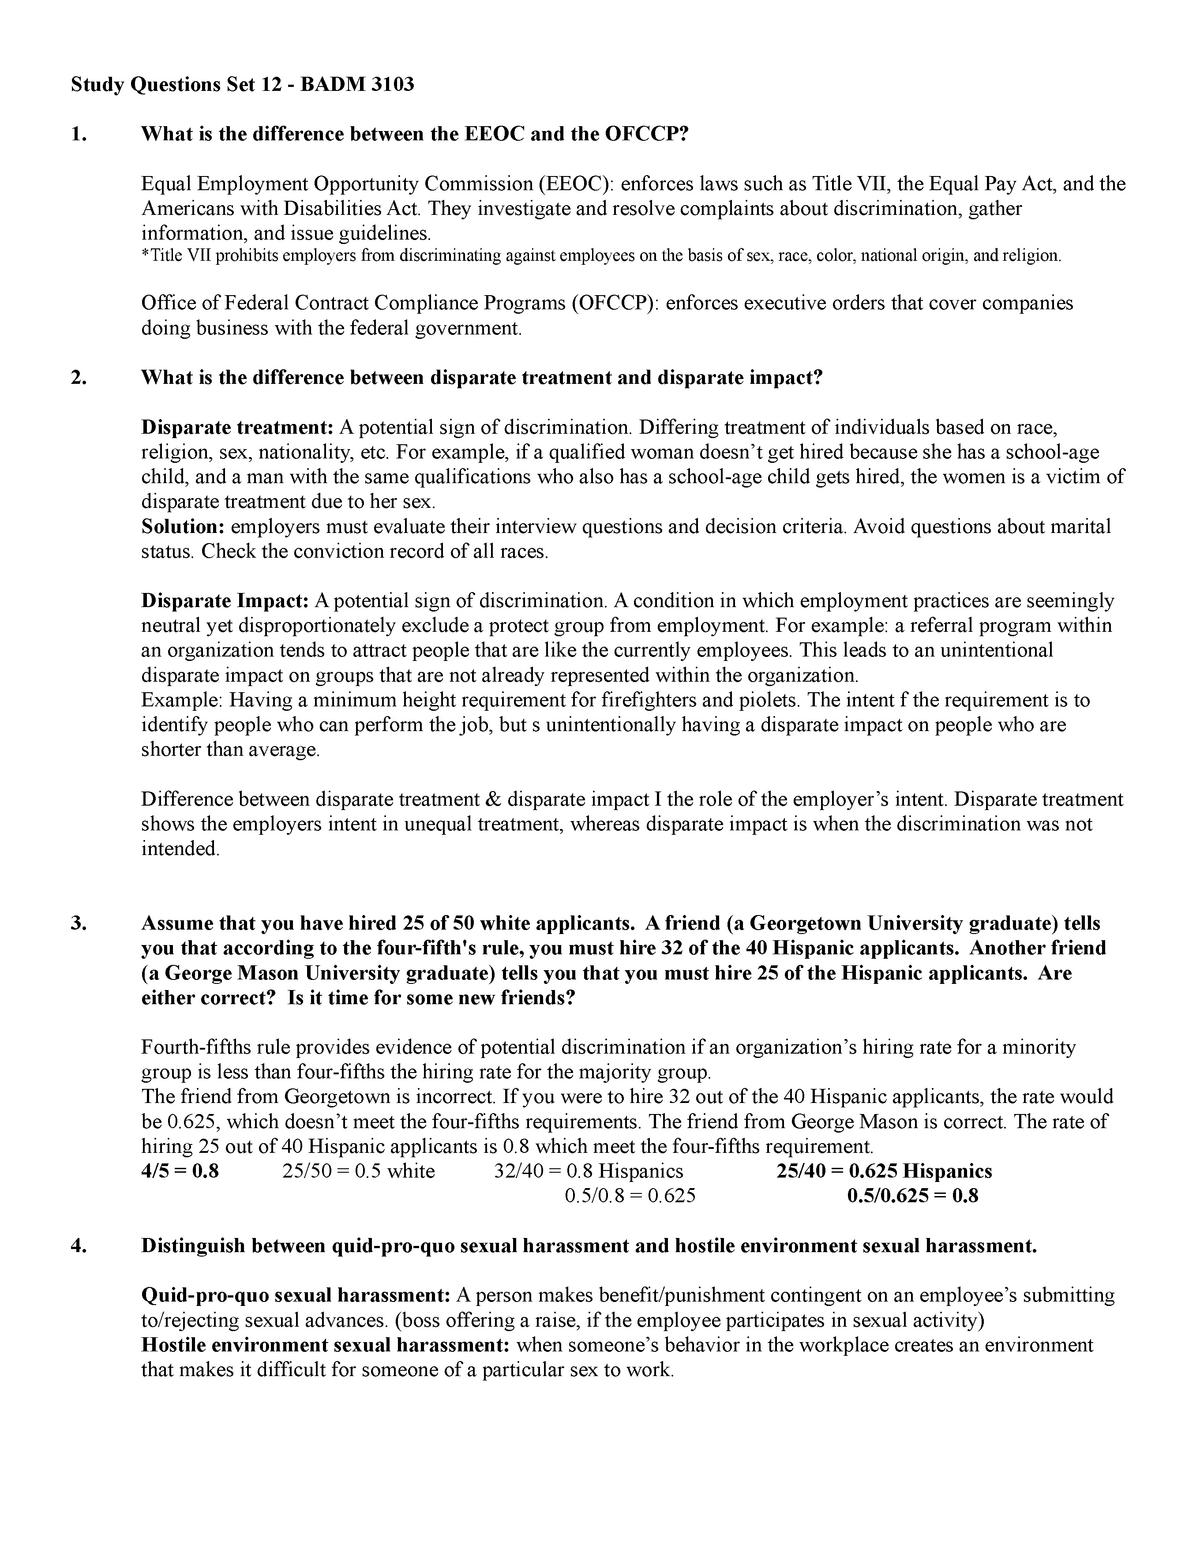 Study Questions Set 12 - BADM 3103 Spring 2019 - BADM 3103